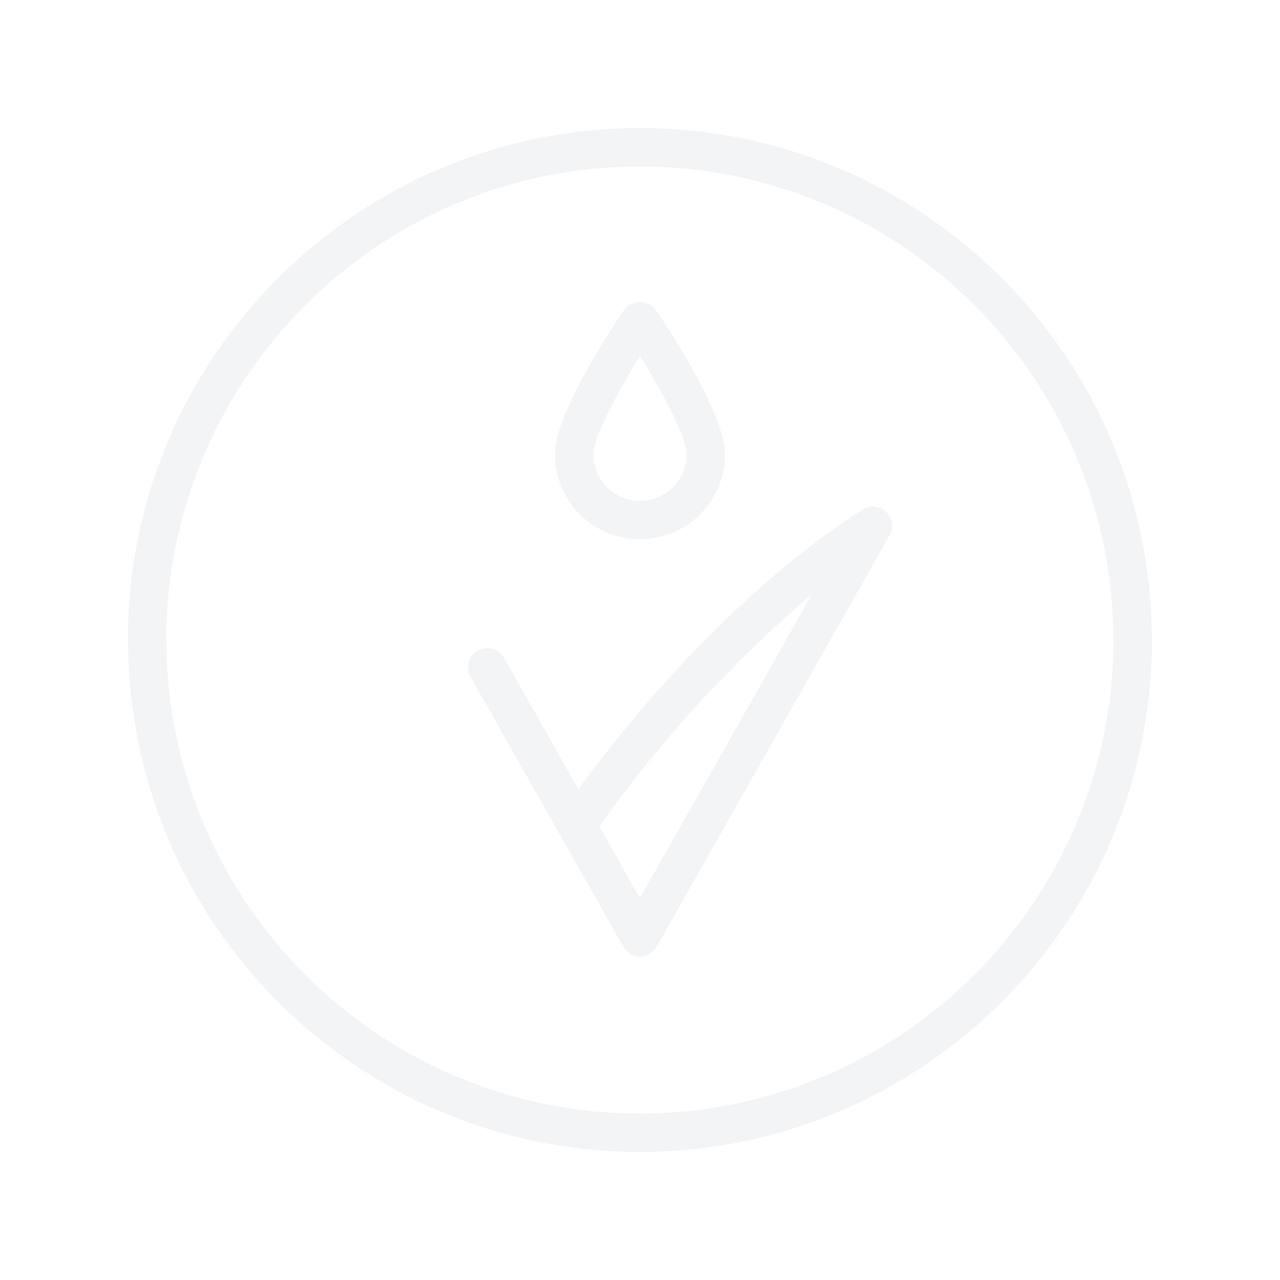 NANSHY Conceal Perfector P01 Brush White